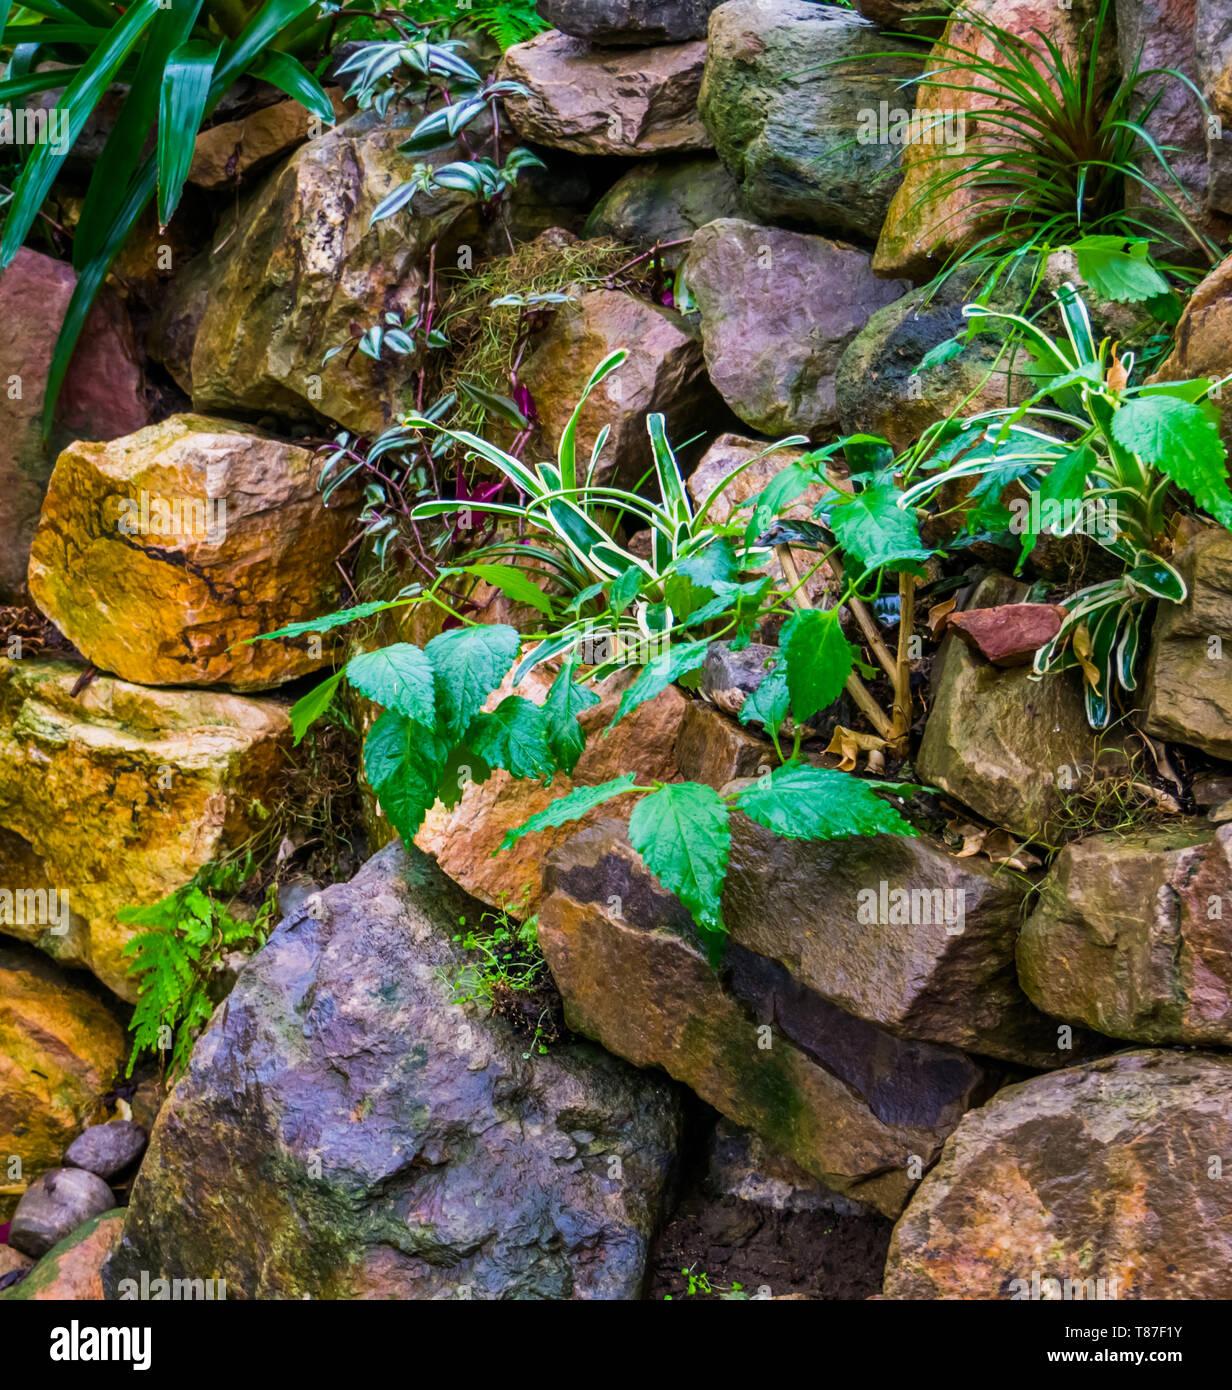 Pile Of Big Rocks In A Tropical Garden Backyard Decorations